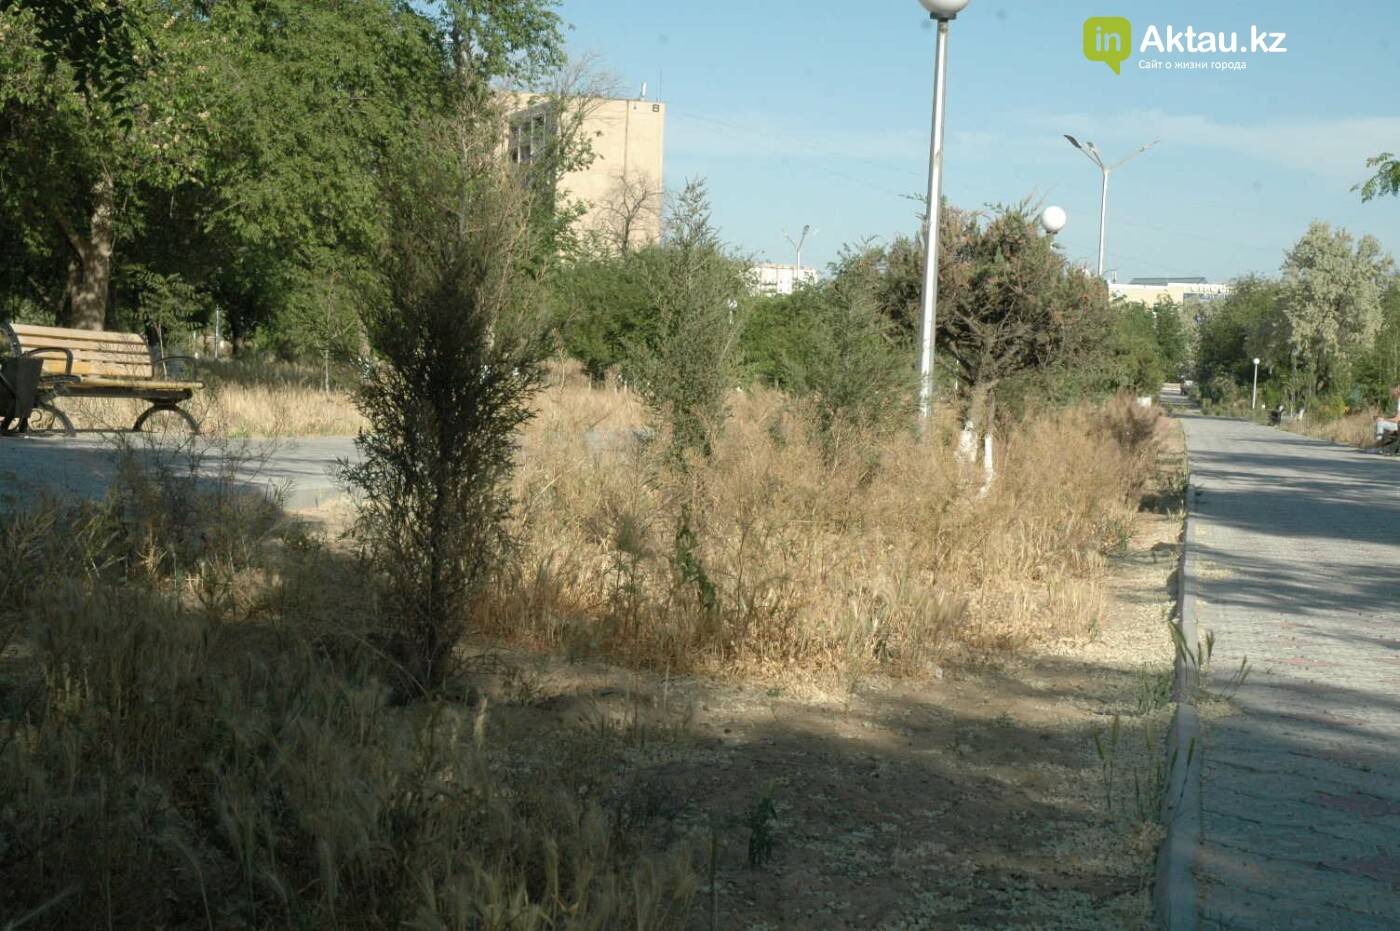 Погибшие от засухи и обезвоживания в Актау исчисляются десятками (ФОТО), фото-2